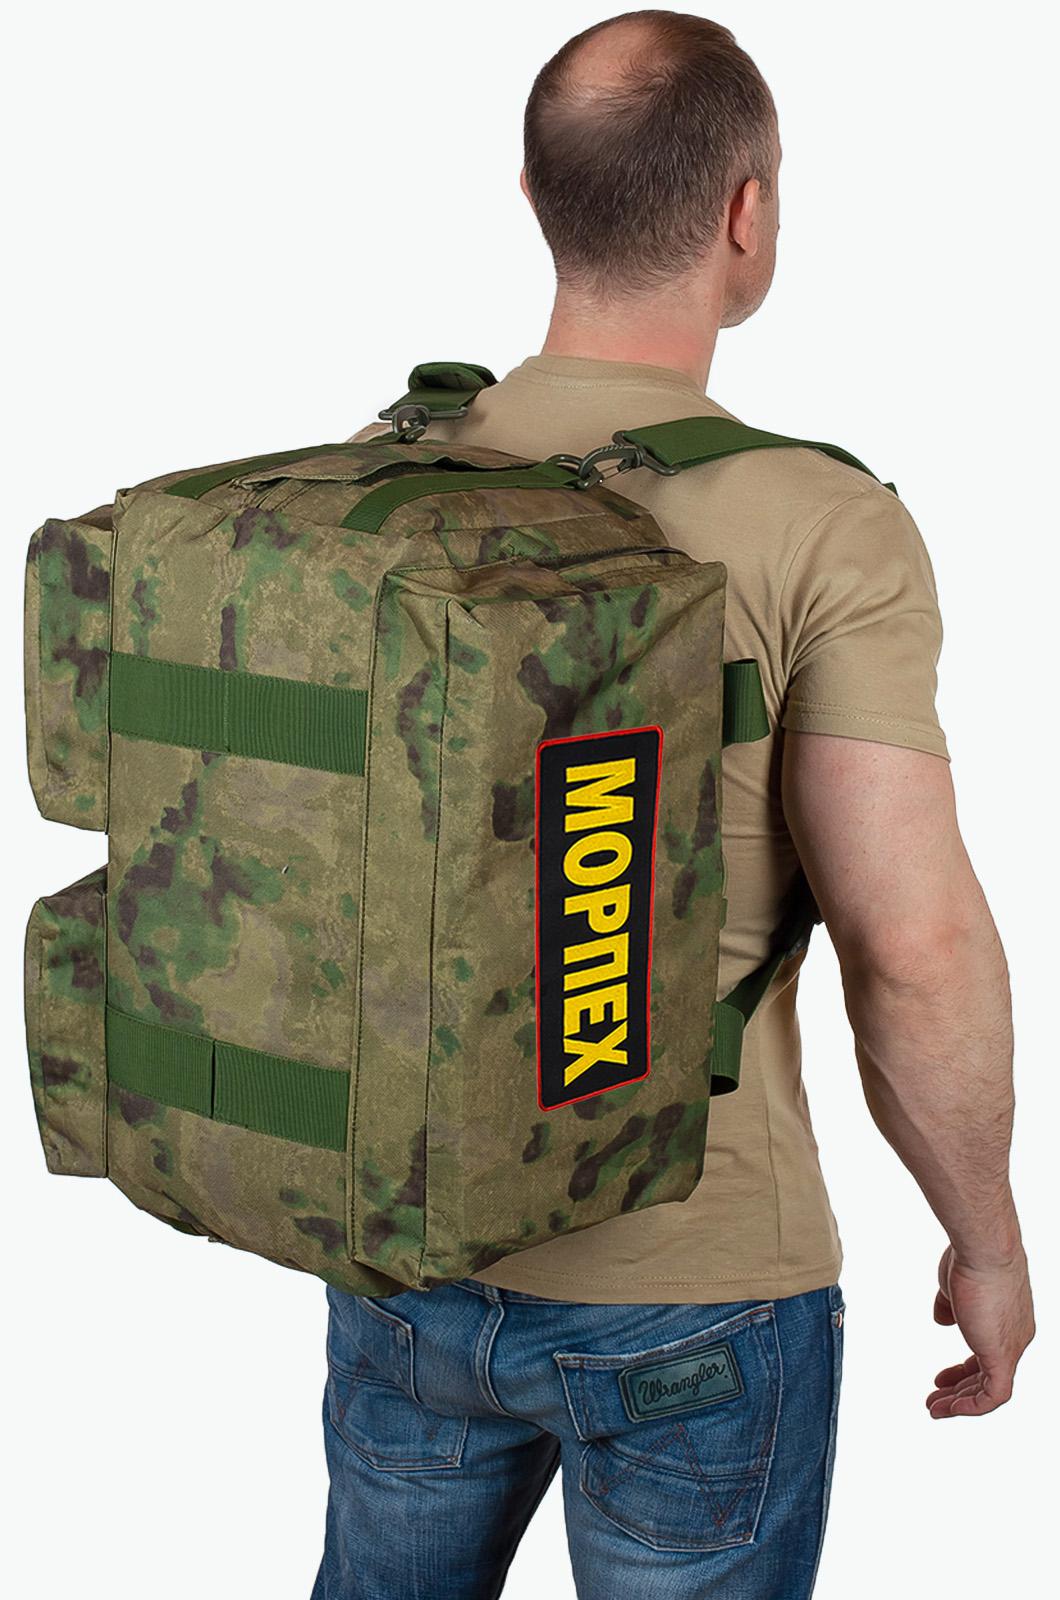 Купить в военторге Военпро походную сумку Морпеха